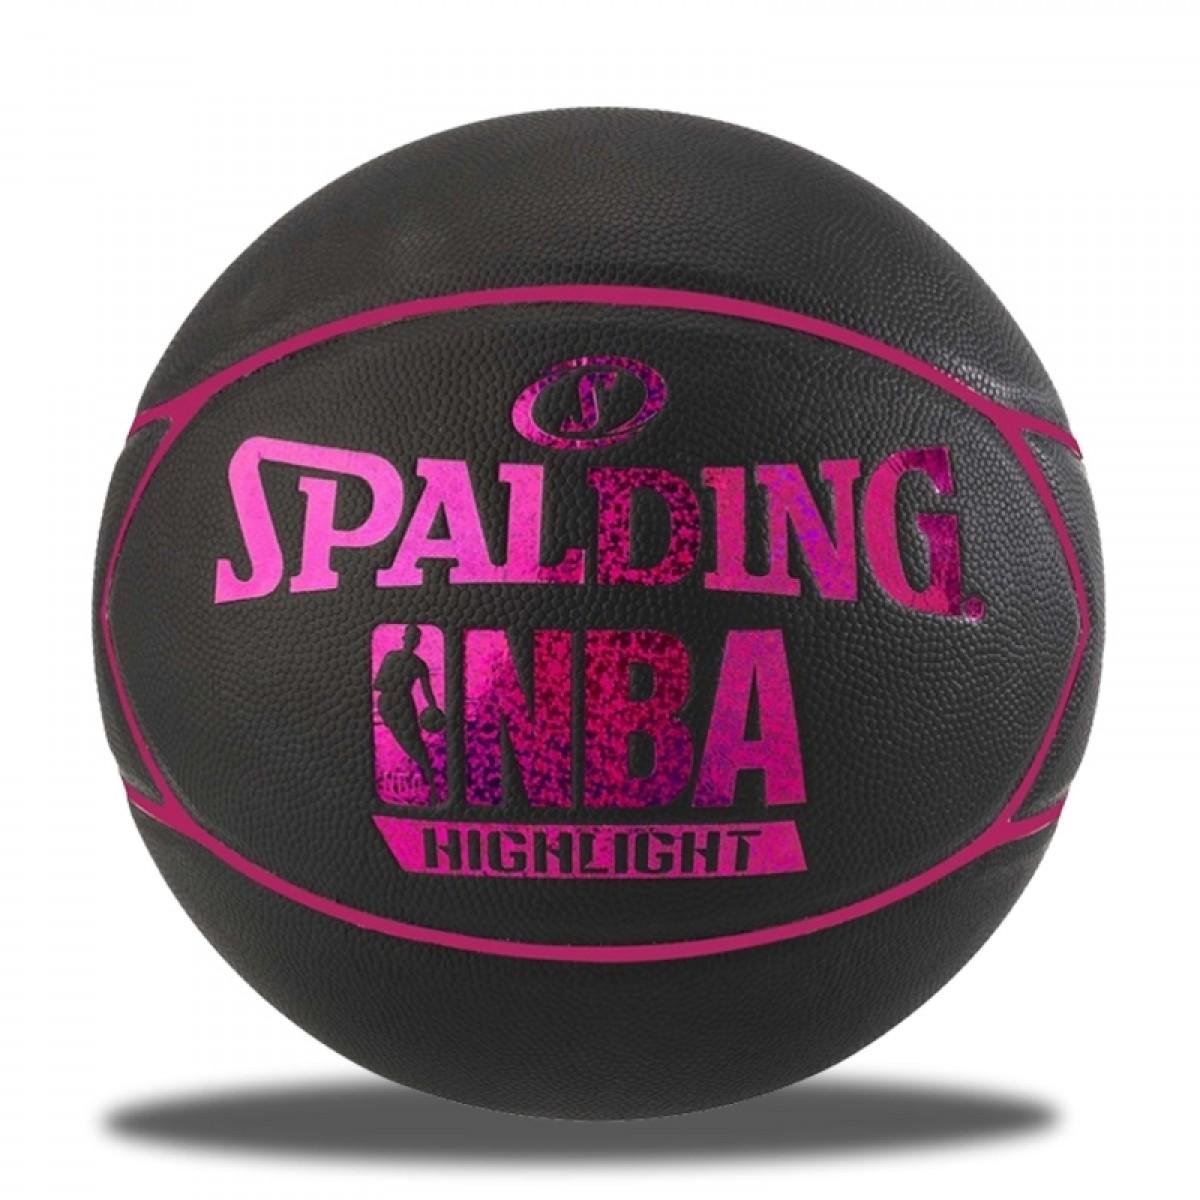 Spalding NBA Highlight 4Her 'Black'